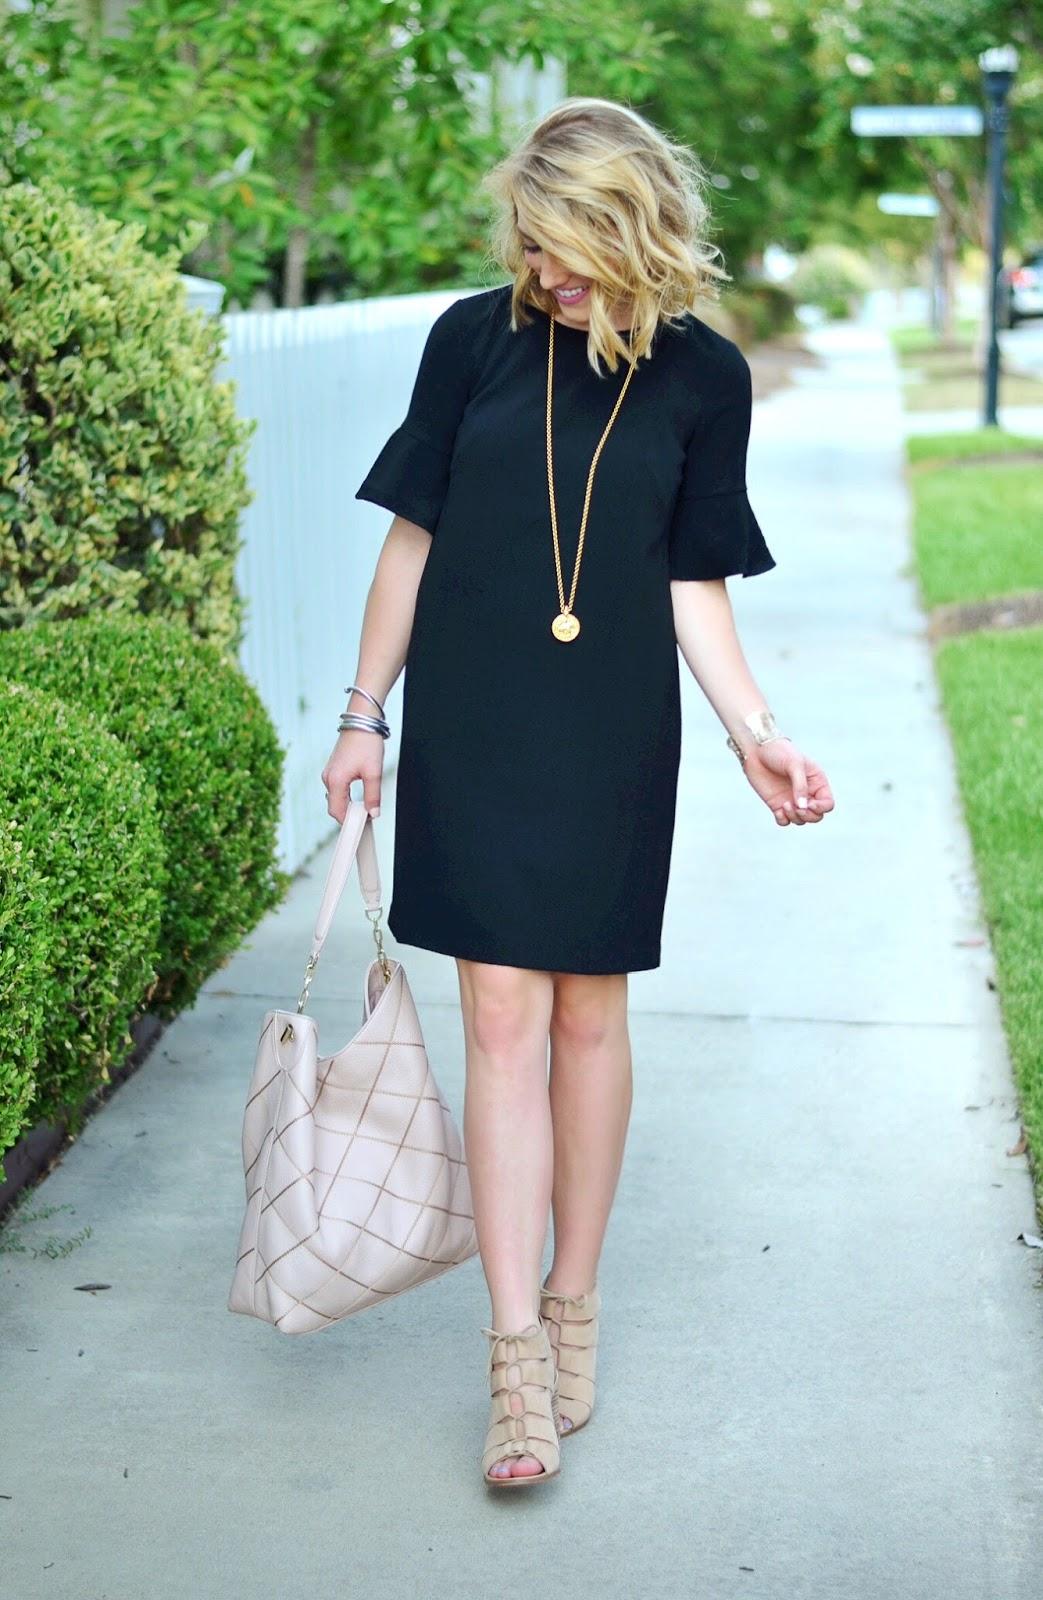 The perfect little black Dress (Something Delightful Blog)